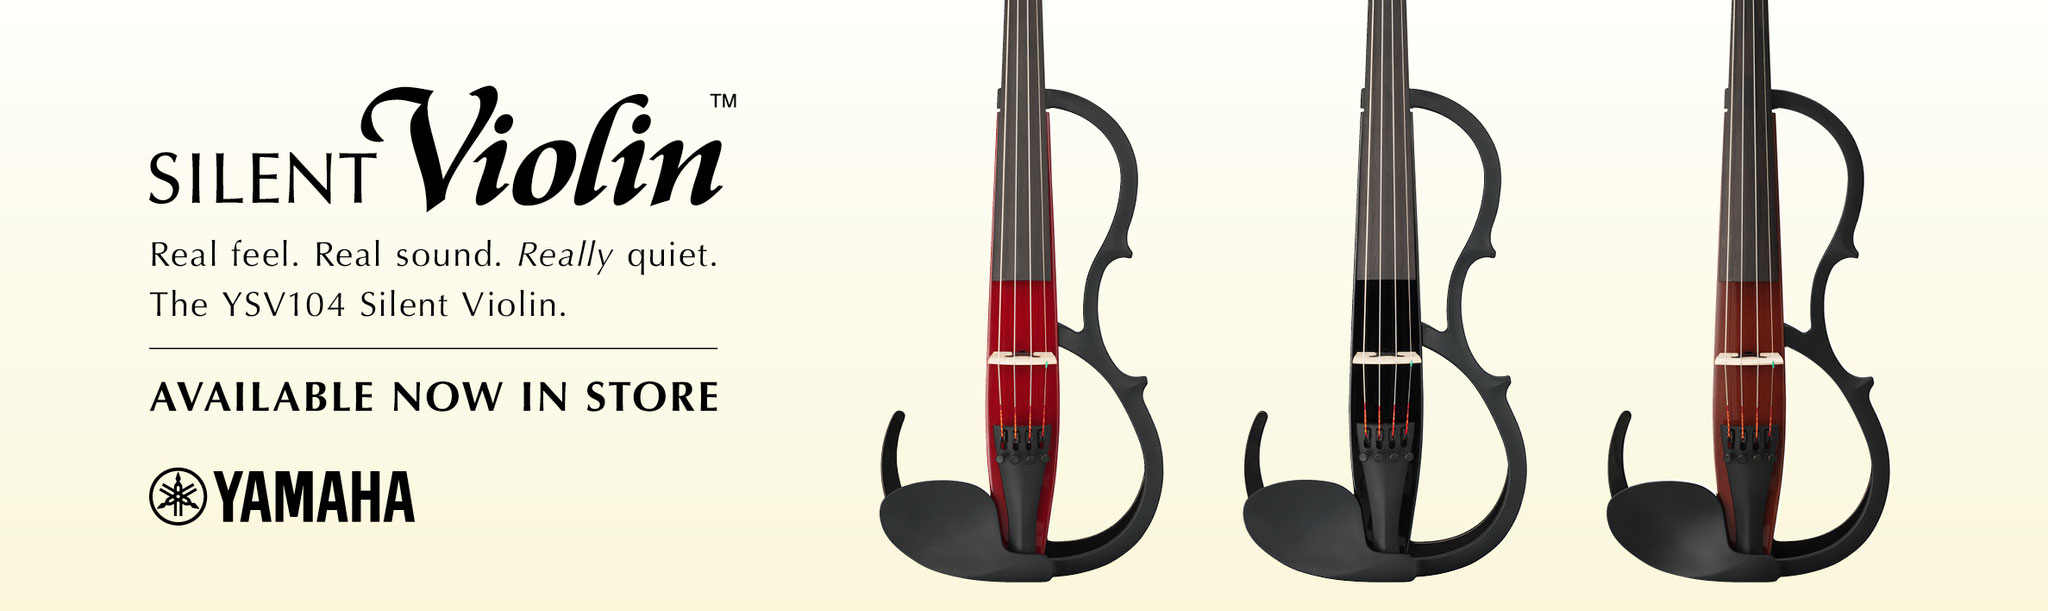 Yamaha Music Mackay - Yamaha Music Mackay